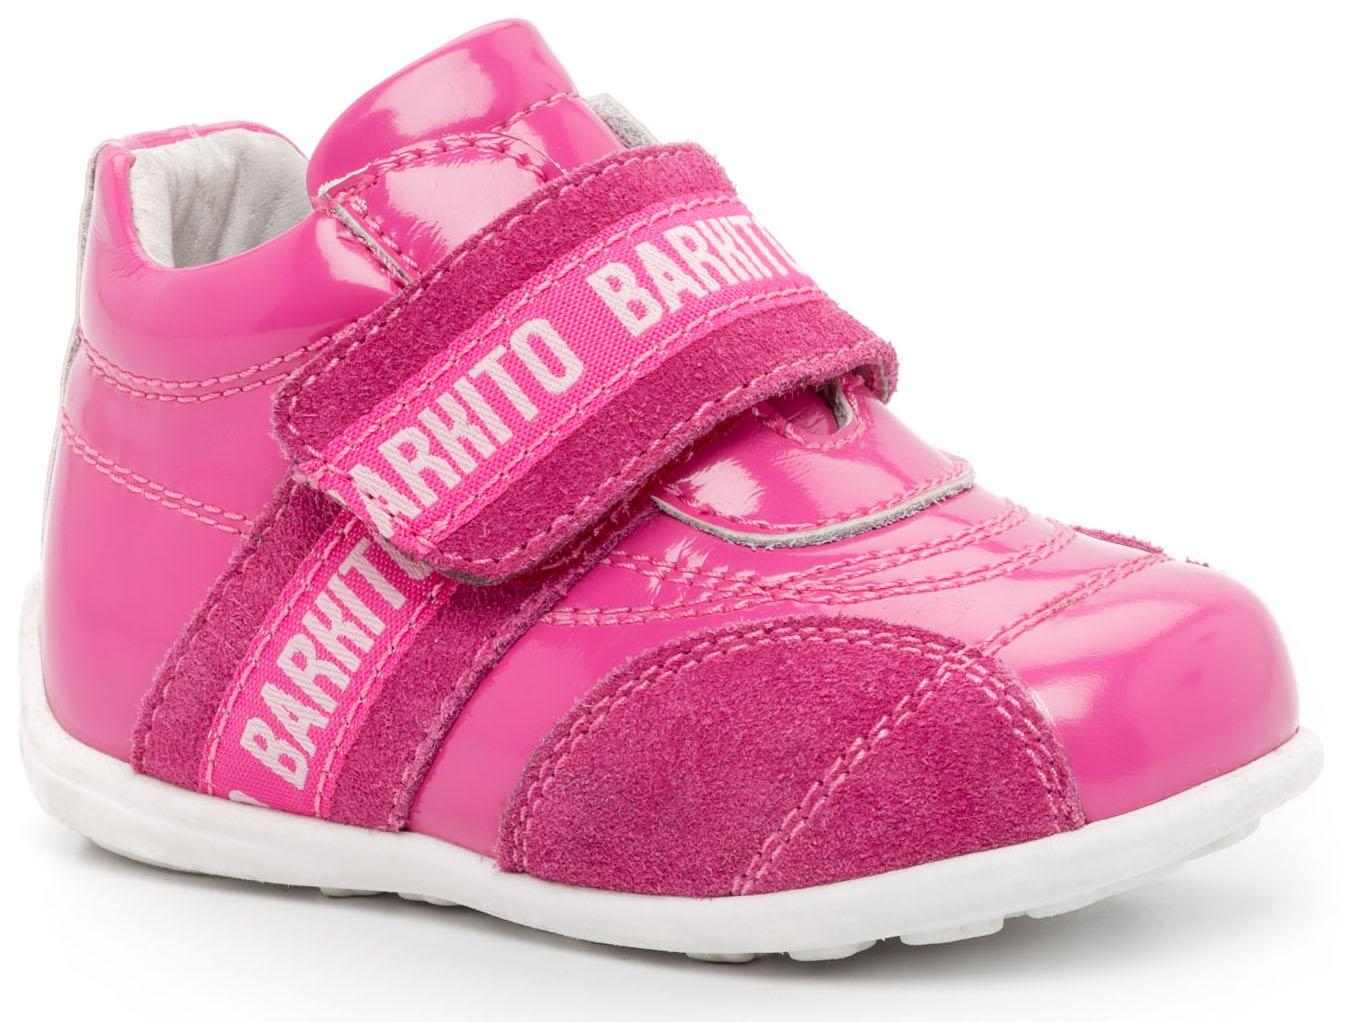 Купить Ботинки и полуботинки, Полуботинки для девочки Barkito, фуксия, Китай, Женский